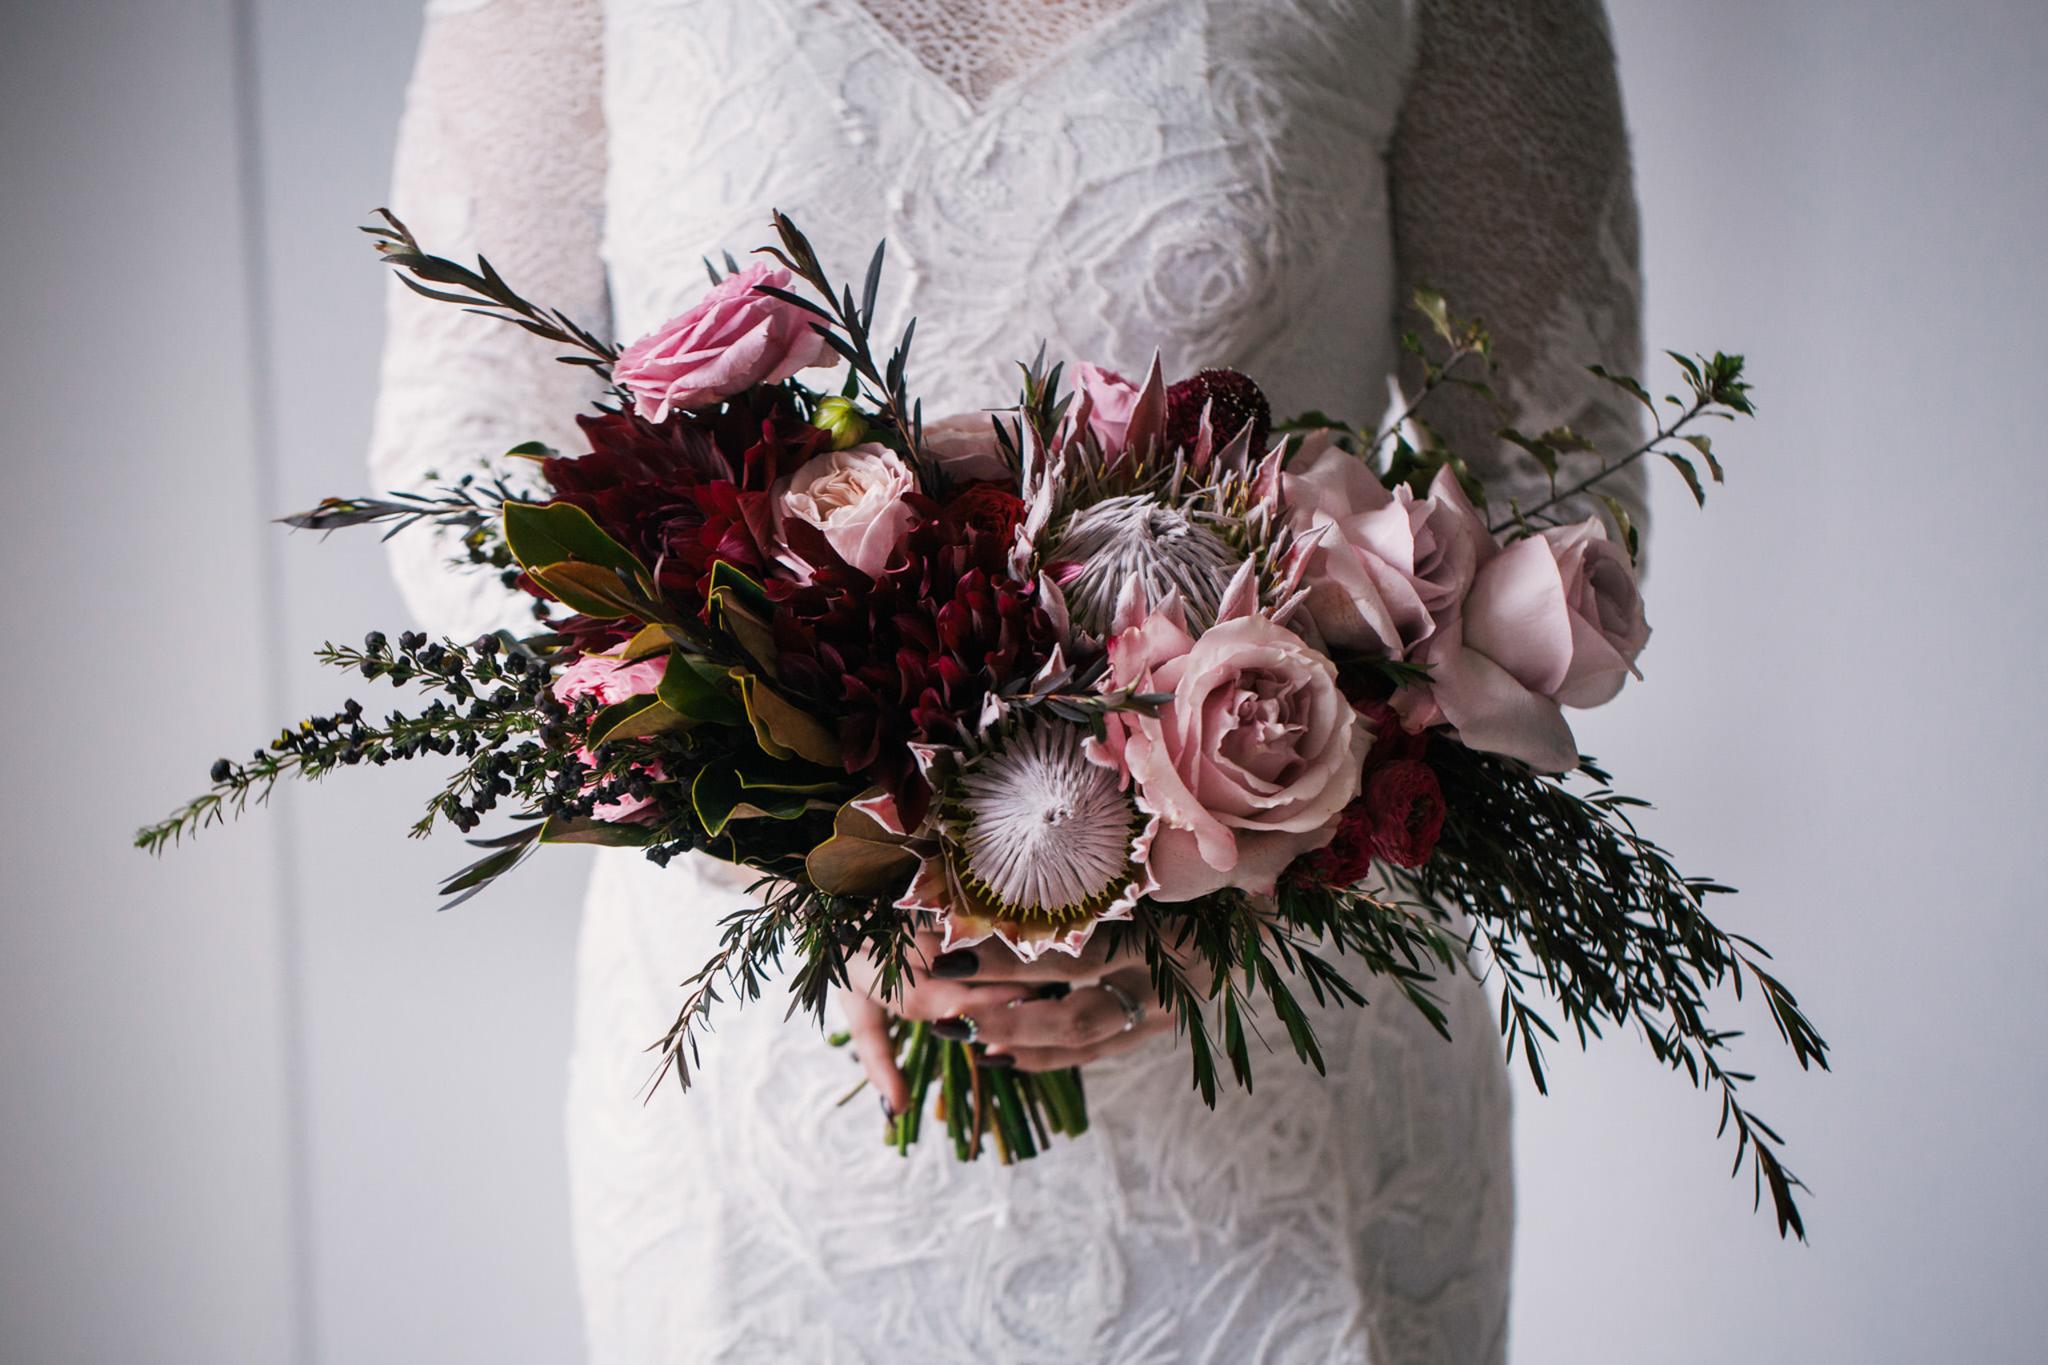 NewBlackStudios_wedding_photography_gallery-33.jpg